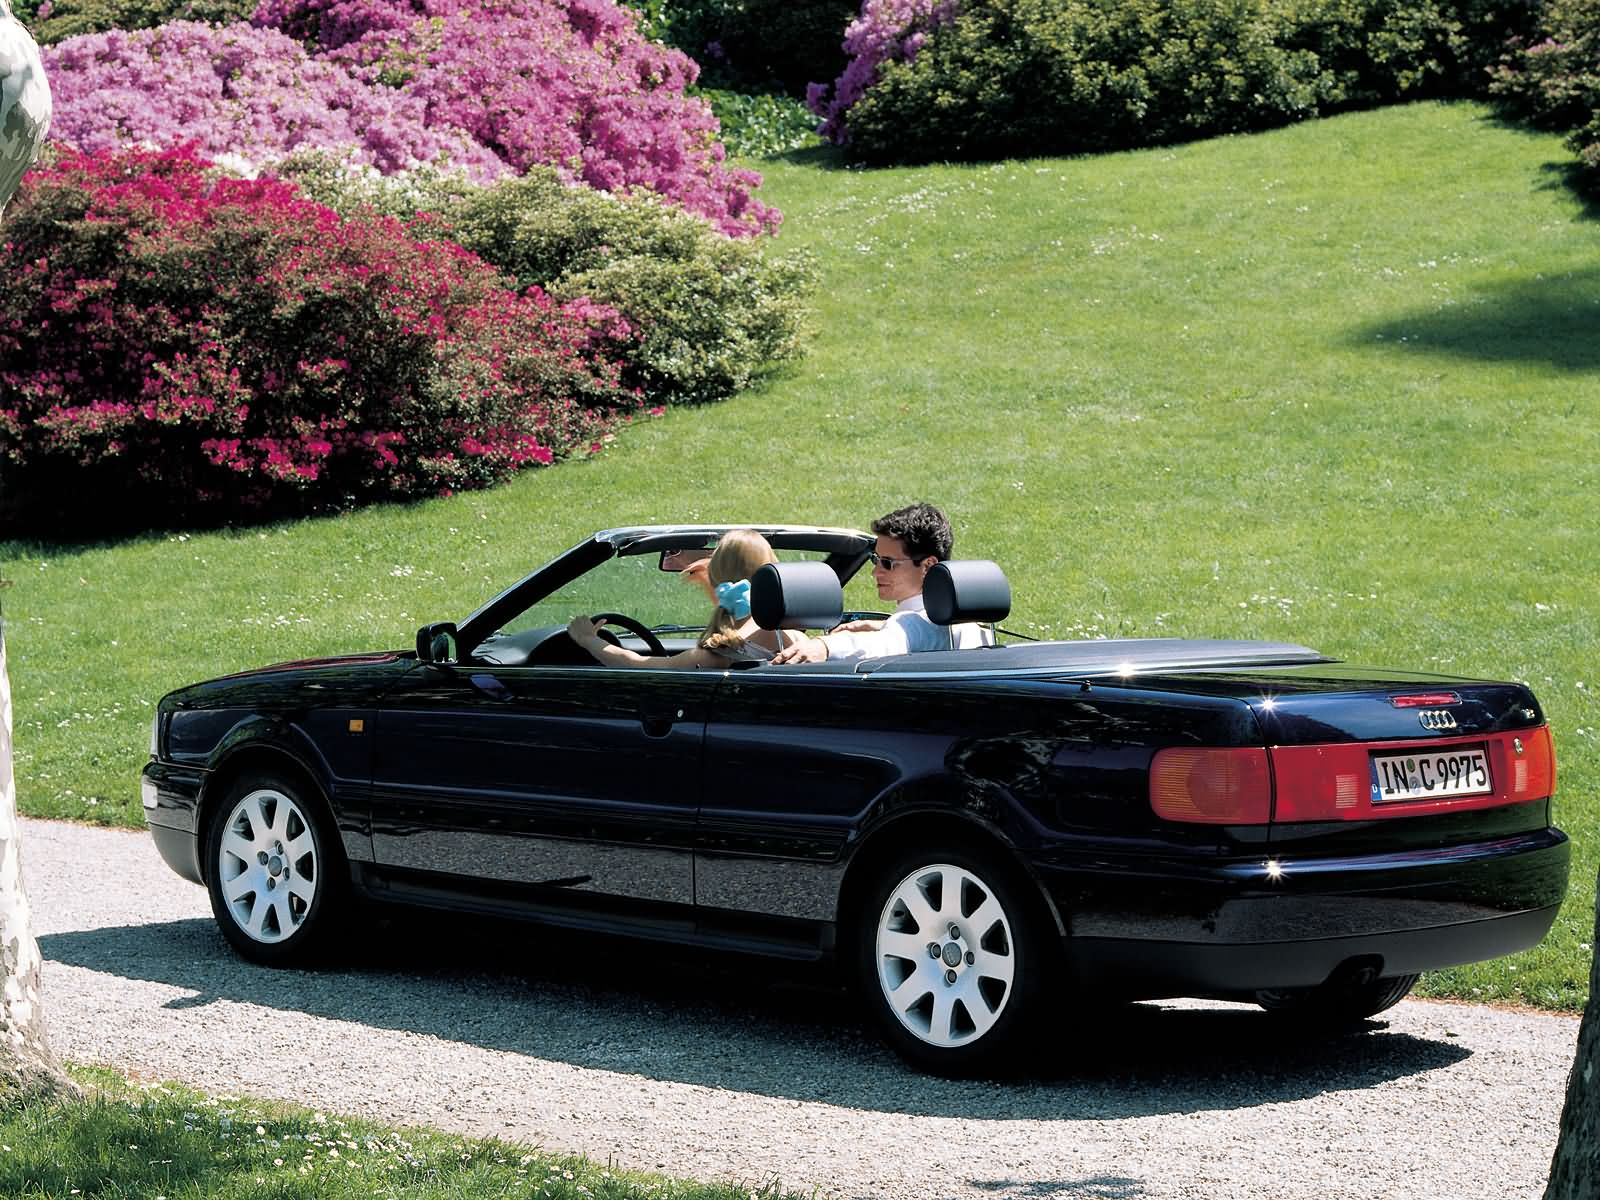 audi a4 cabrio 1998 audi a4 cabrio 1998 photo 11 car in pictures car photo gallery. Black Bedroom Furniture Sets. Home Design Ideas